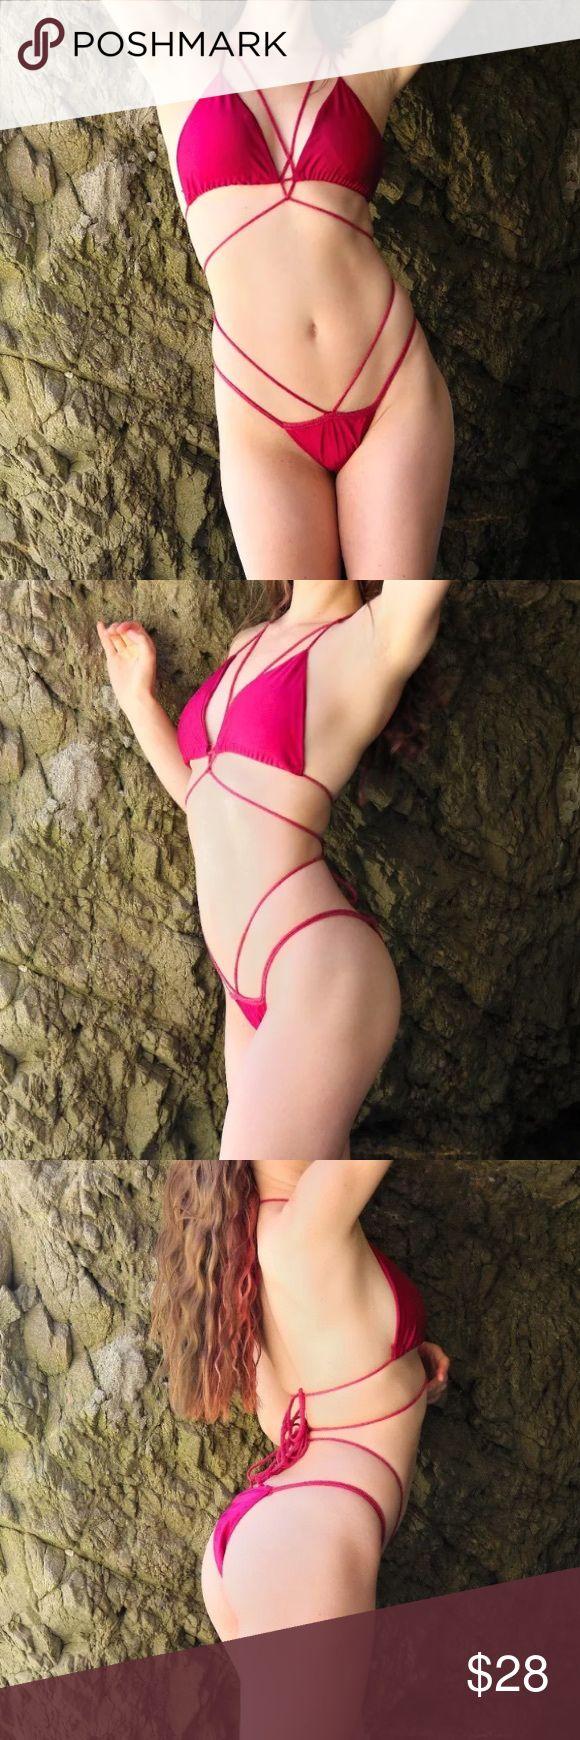 25+ best Extreme Bikini ideas on Pinterest